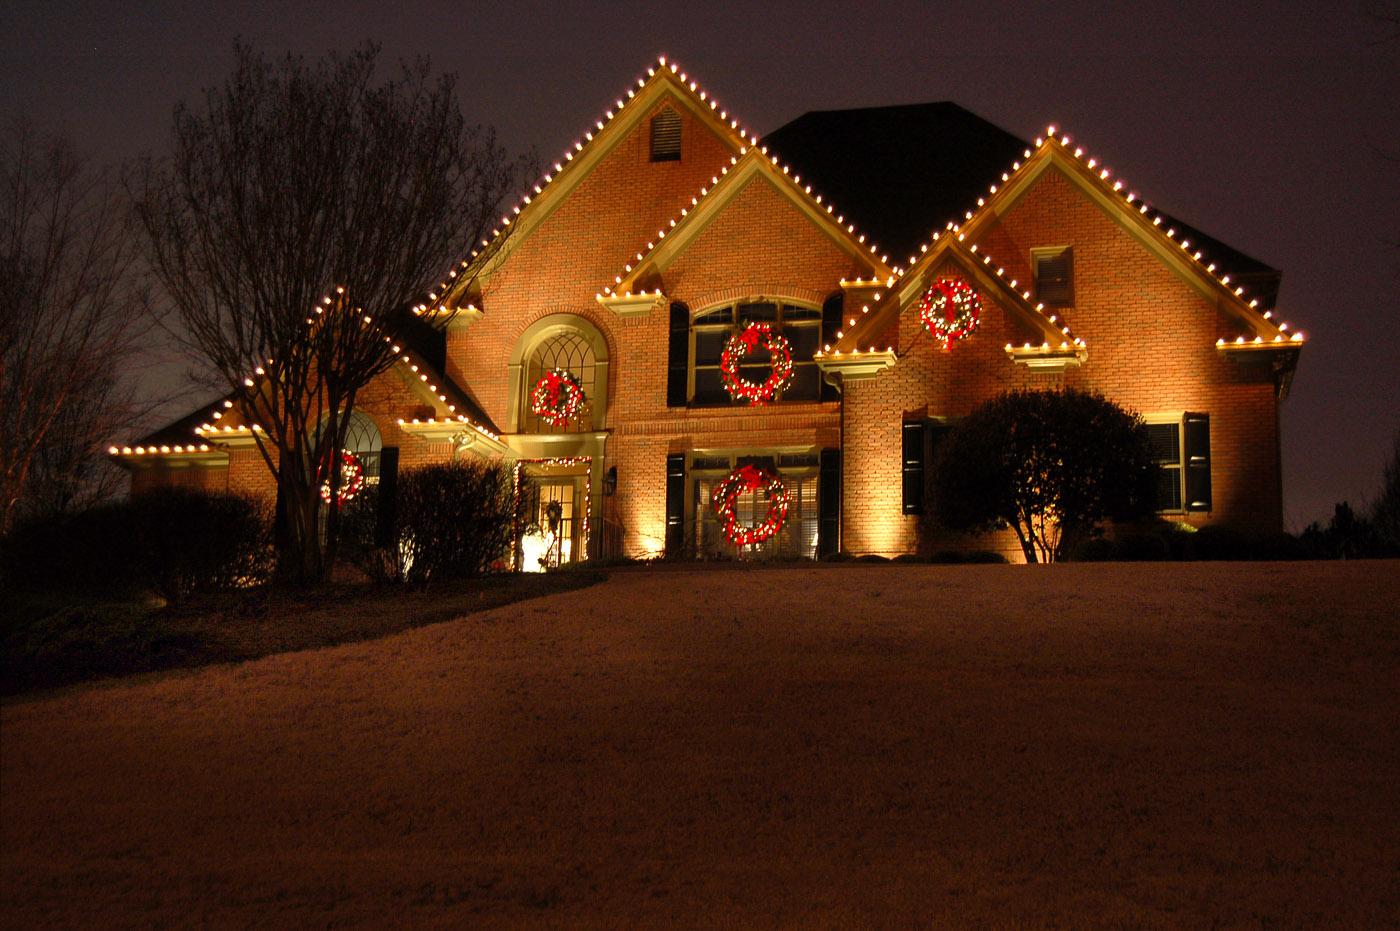 c9-outdoor-christmas-lights-photo-11